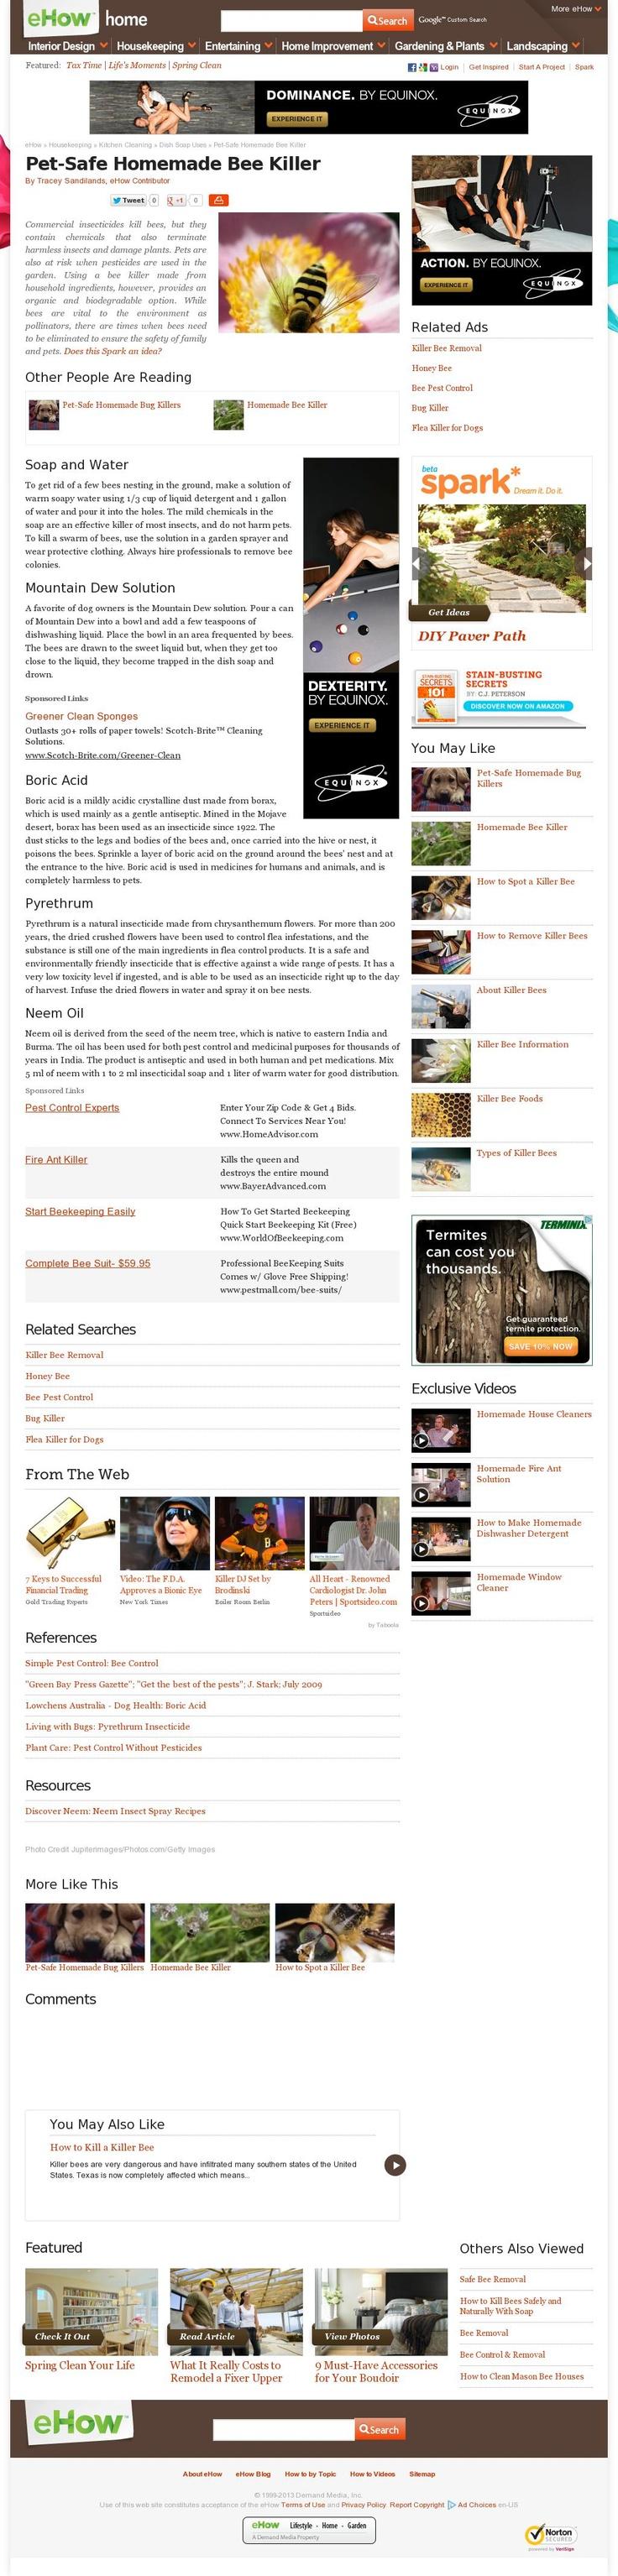 The website 'http://www.ehow.com/info_8567859_petsafe-homemade-bee-killer.html' courtesy of @Pinstamatic (http://pinstamatic.com)